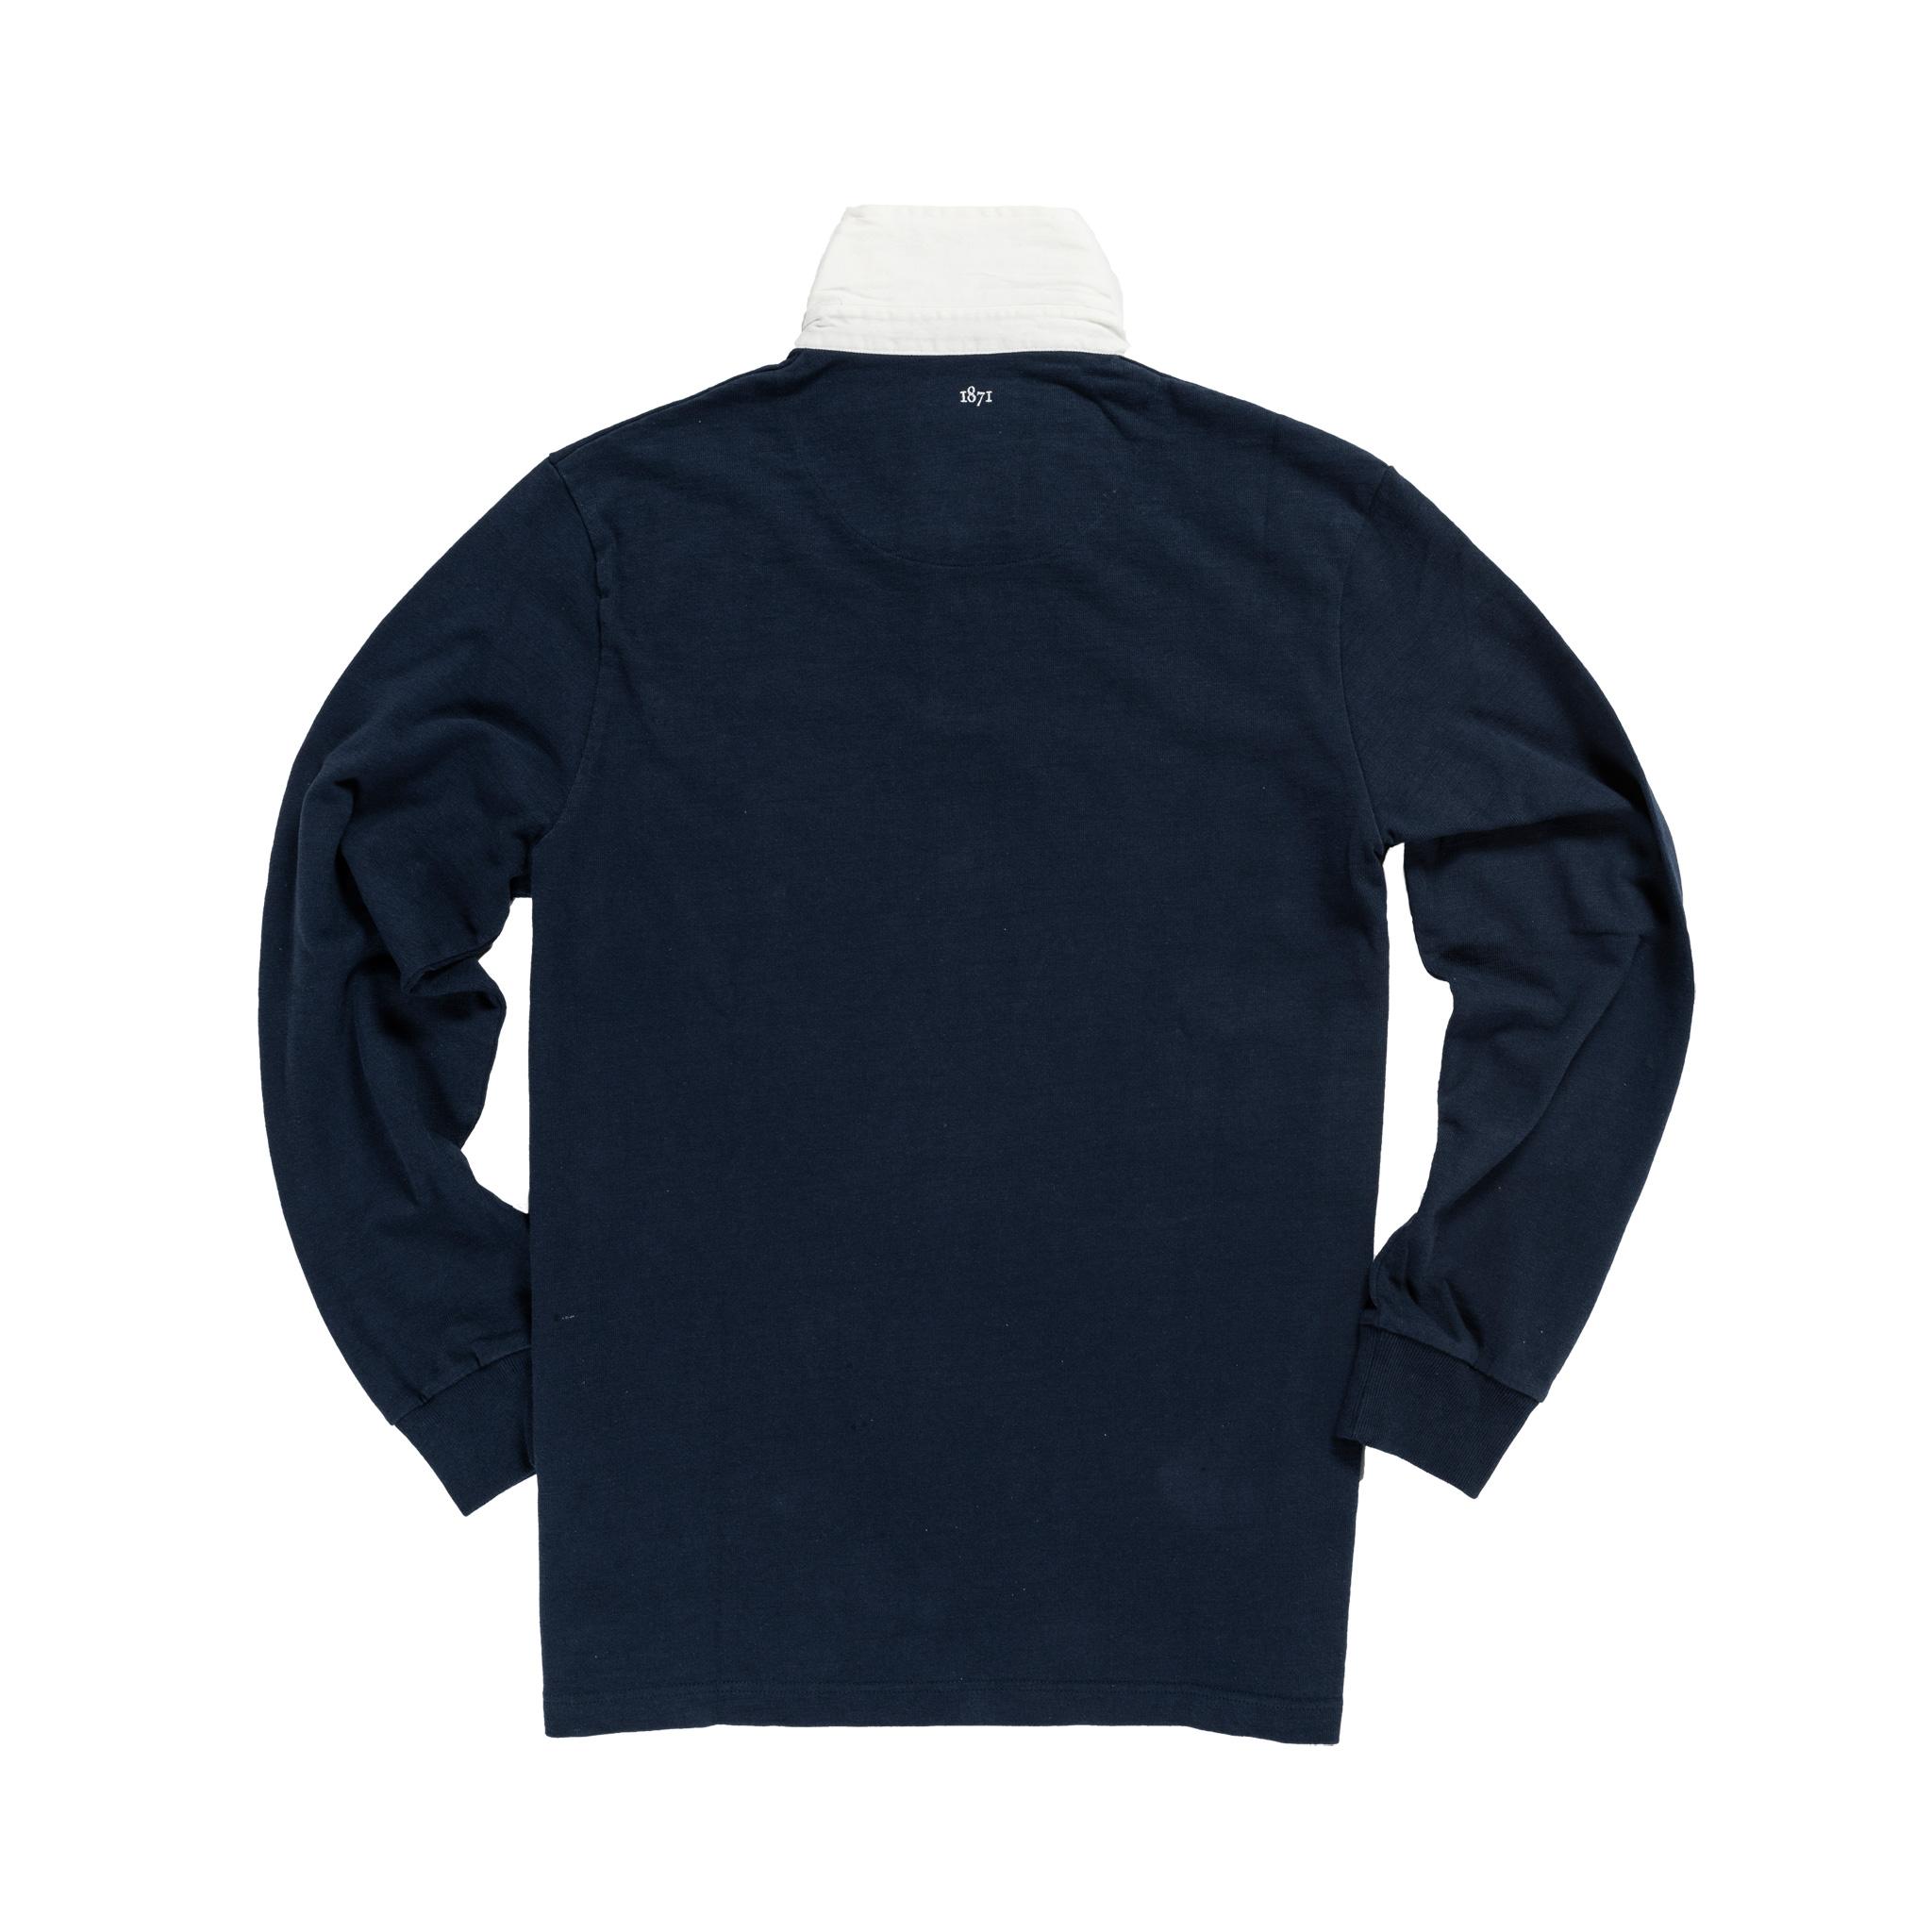 Harrow 1572 Rugby Shirt_Back